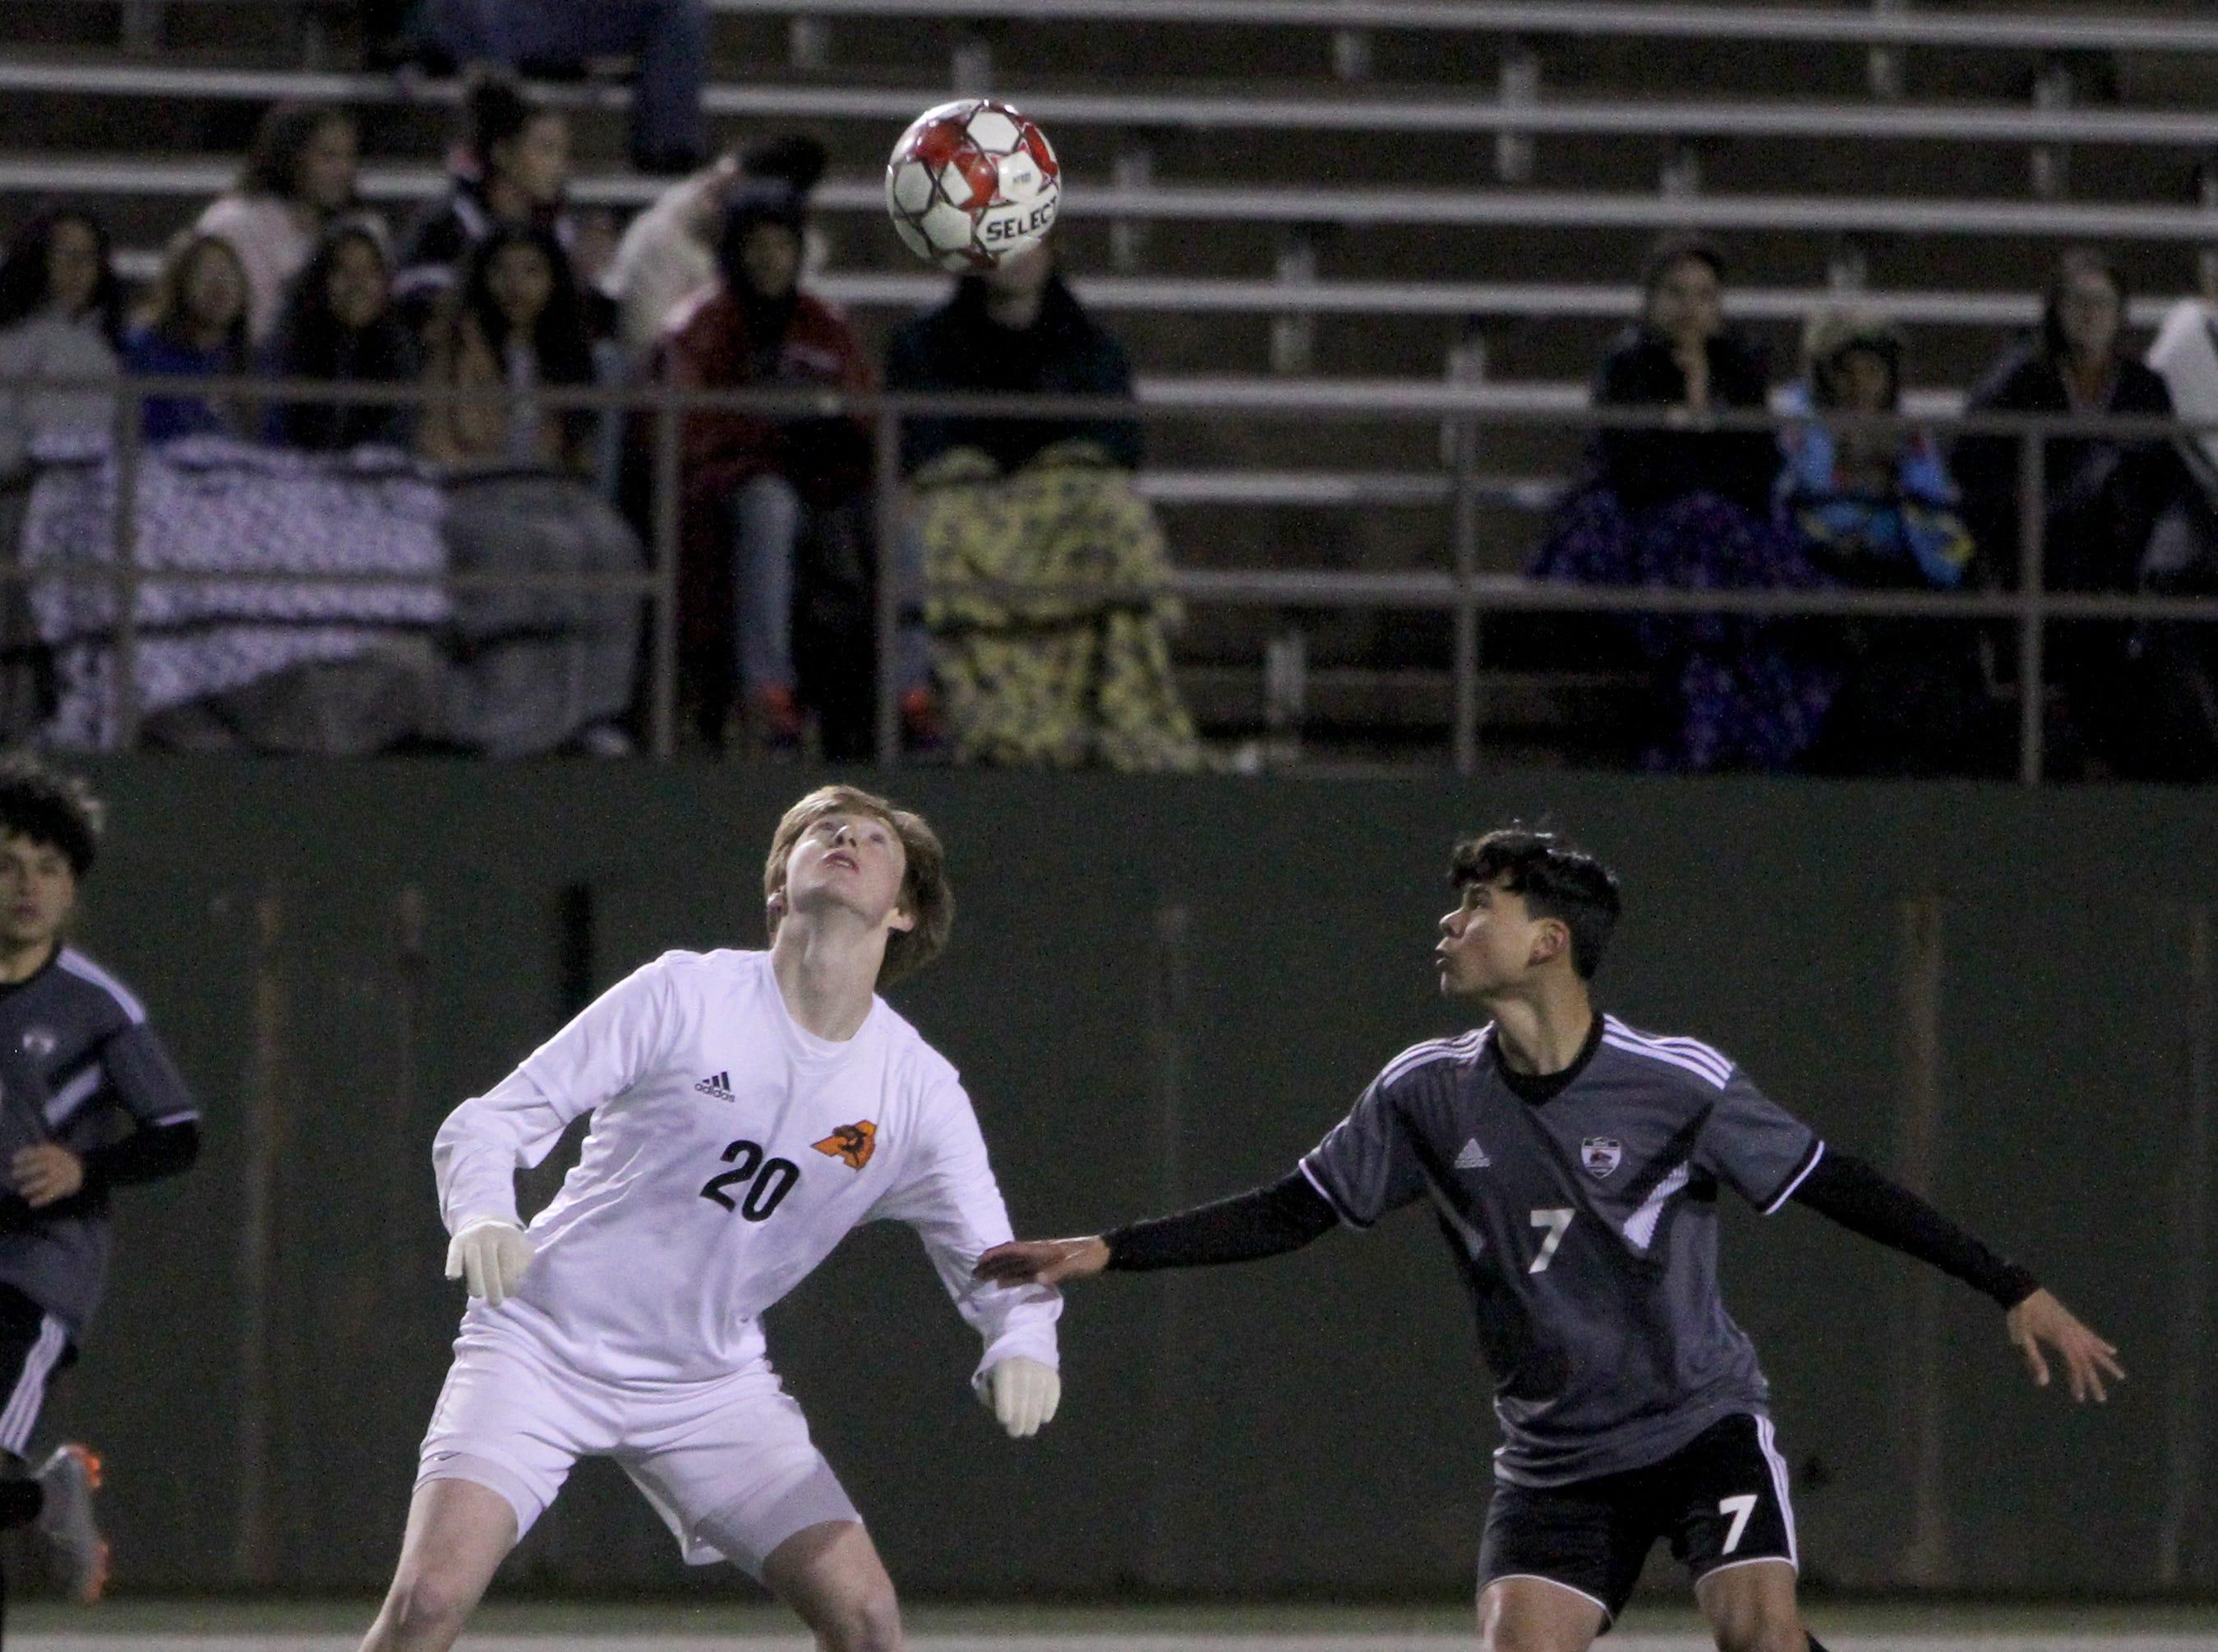 Wichita Falls High School's Daniel Alvarez (7) and Aledo's Austin Jones looks to the ball Tuesday, March 5, 2019, at Memorial Stadium.